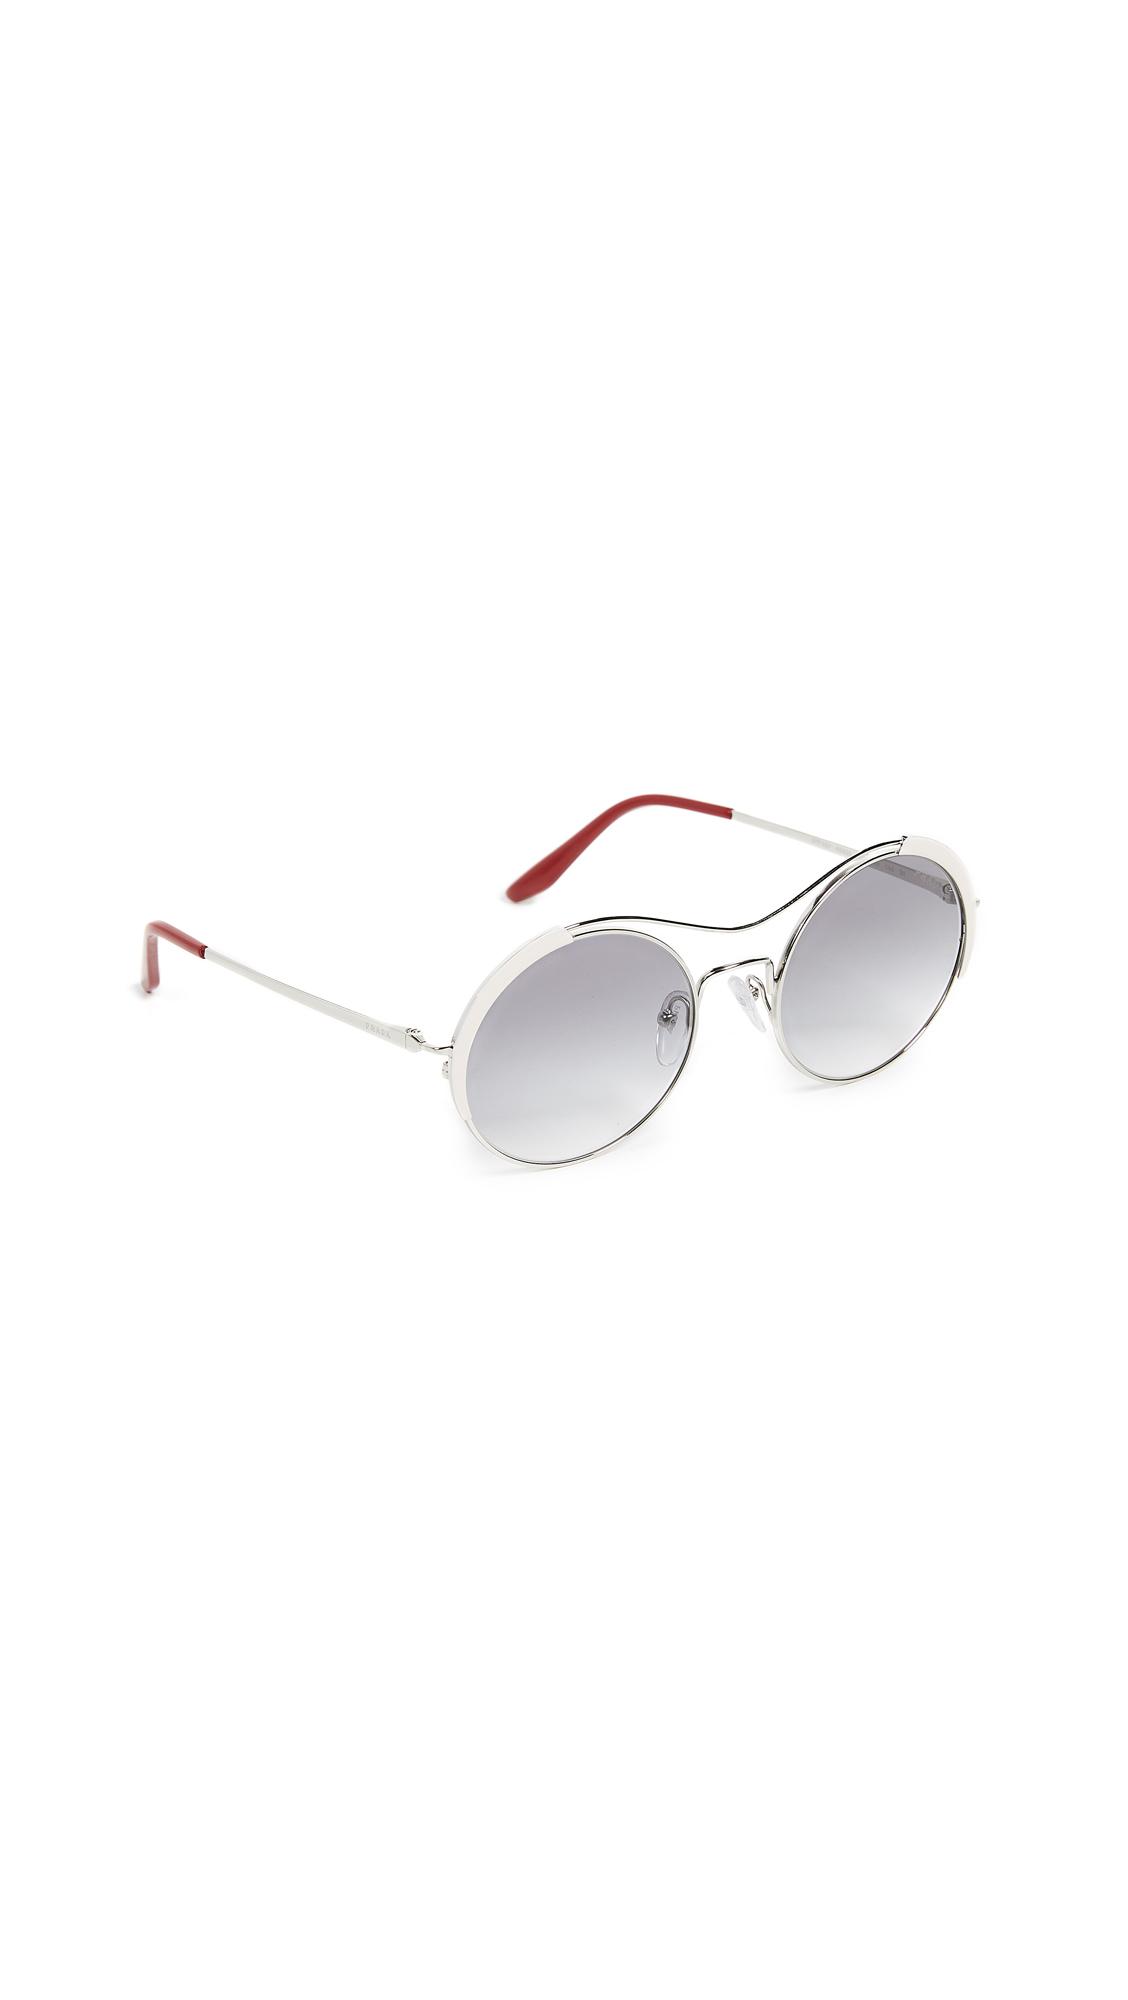 684b405de591 Prada PR 55VS Round Aviators Sunglasses